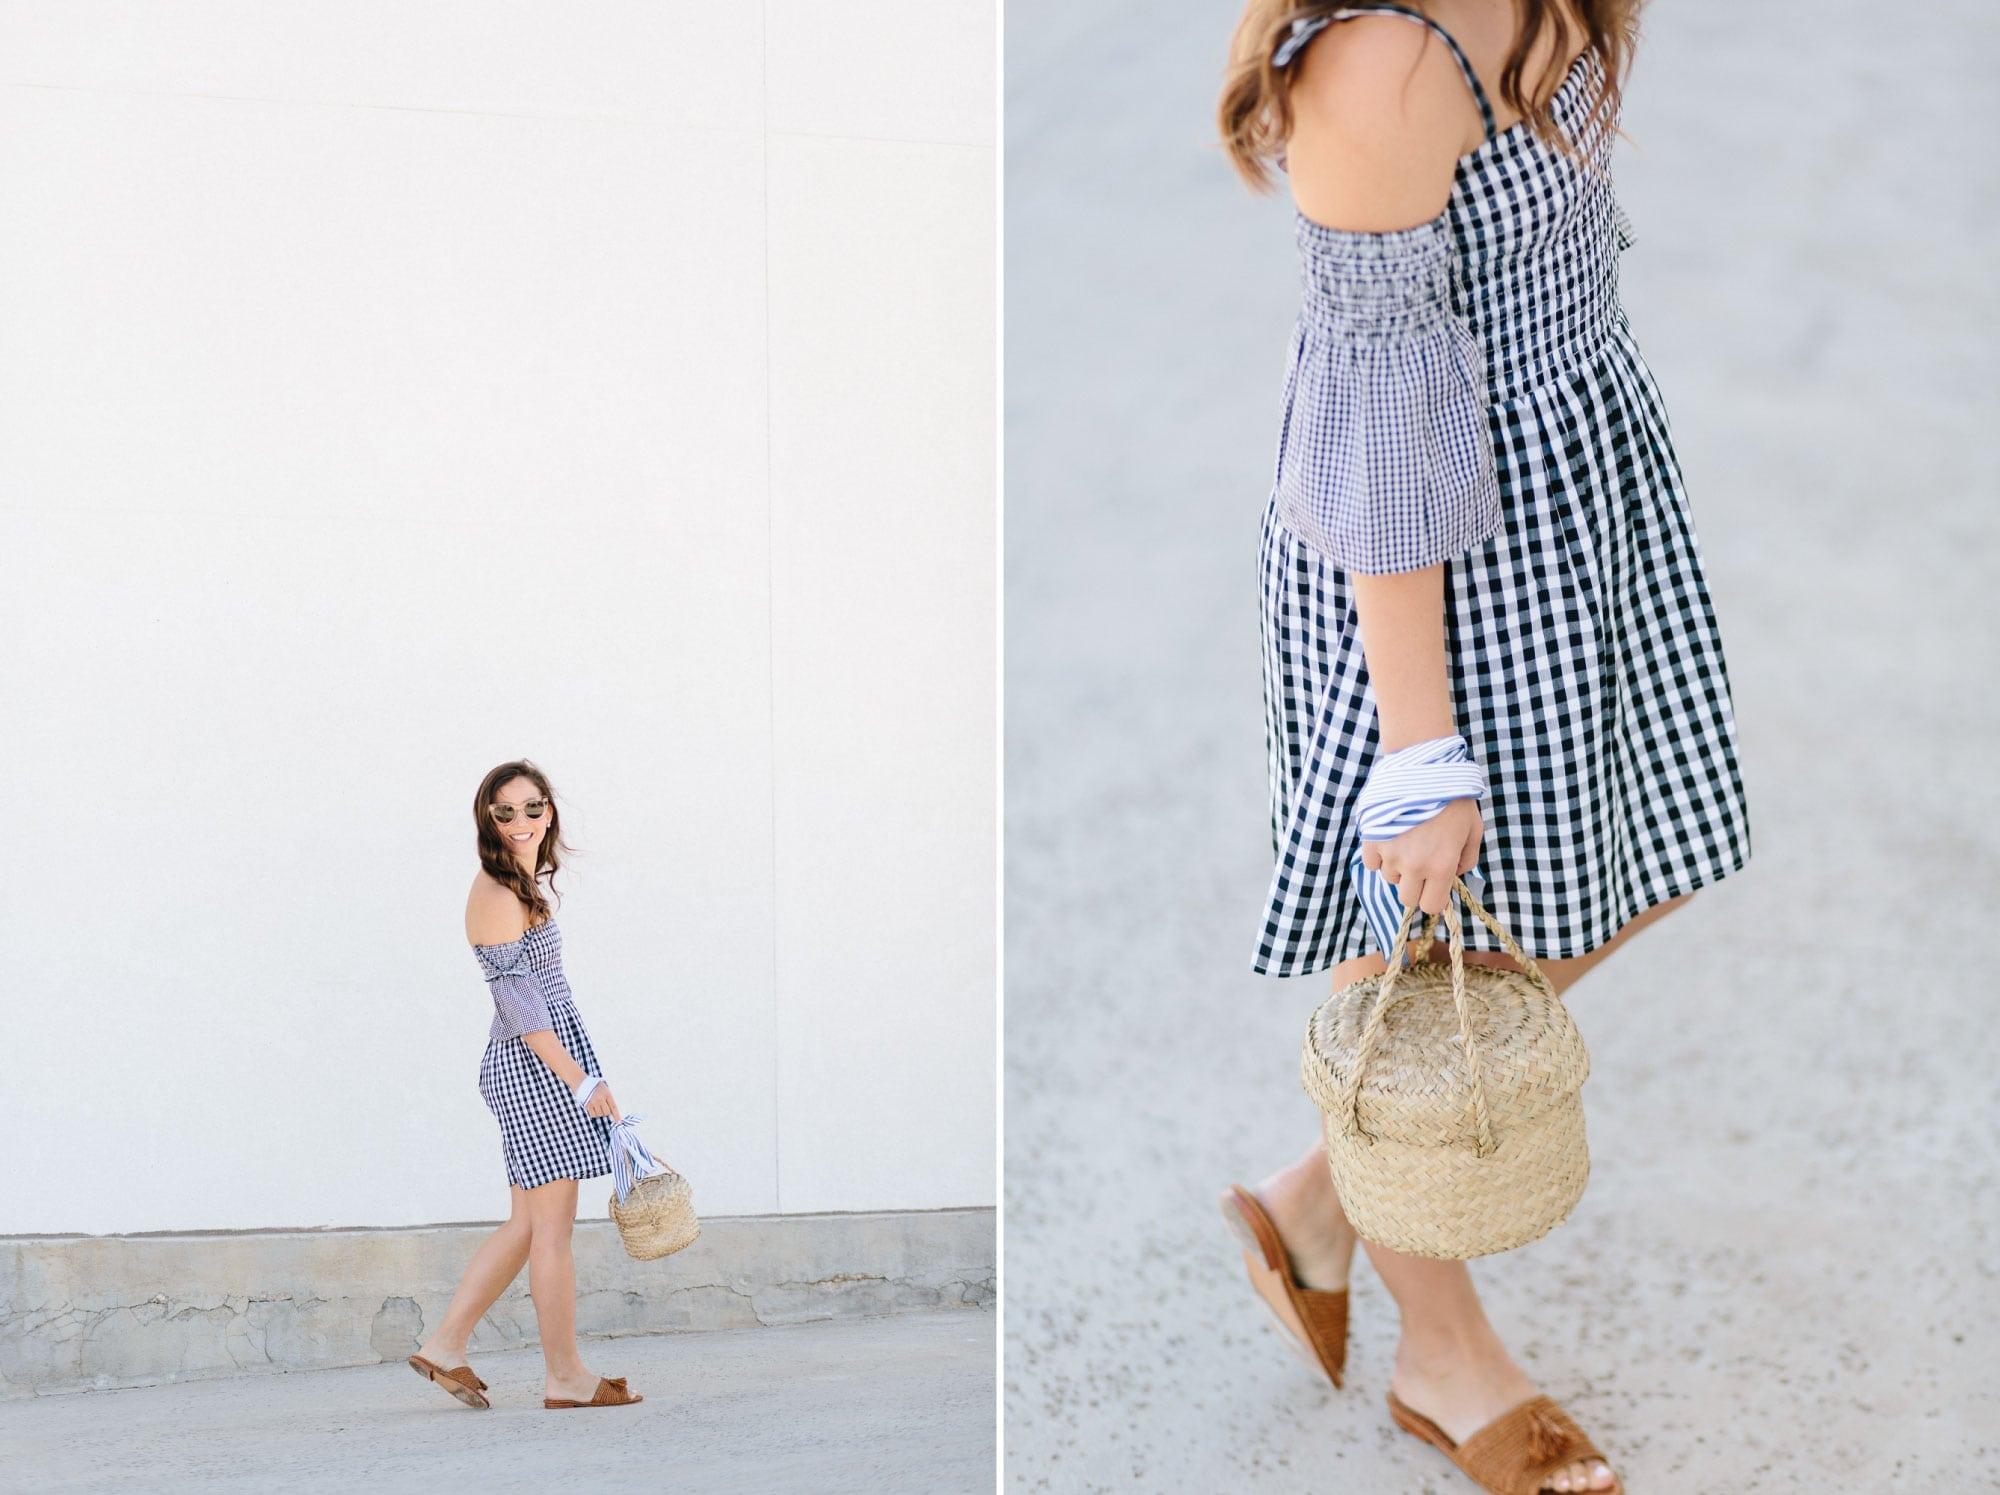 Gigham Dress Details from Shopbop